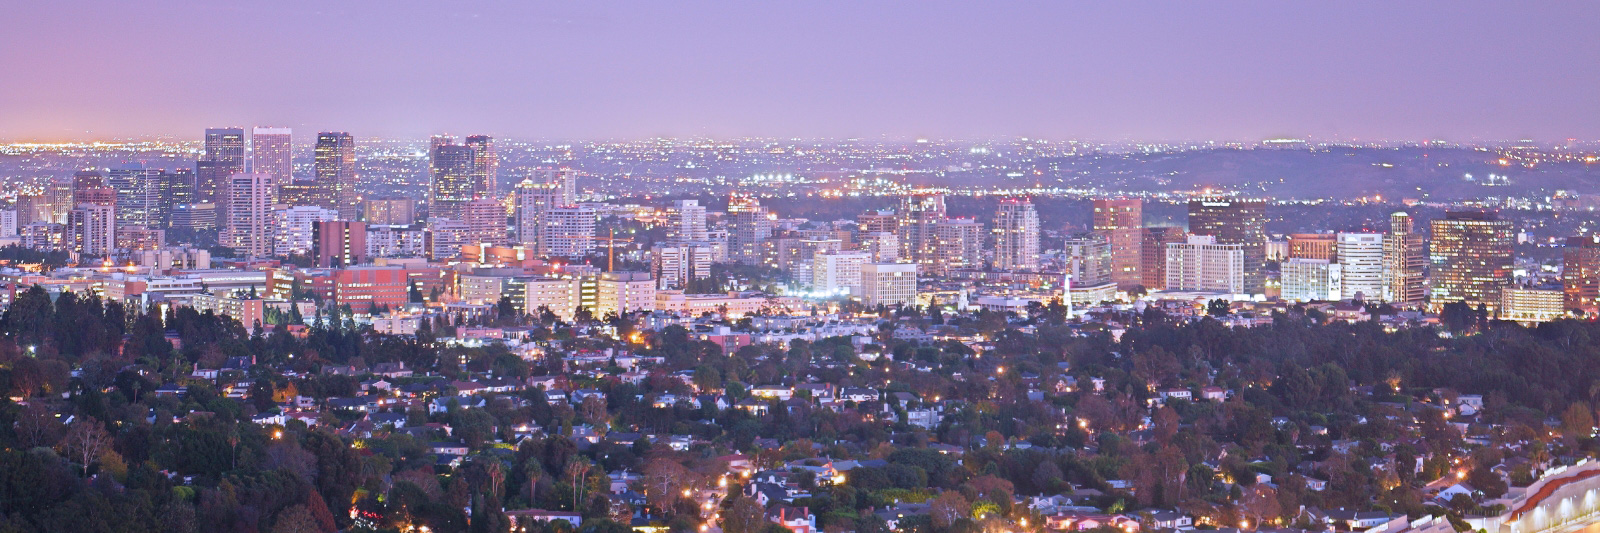 Welcome-to-West-LA-1600x533.jpg